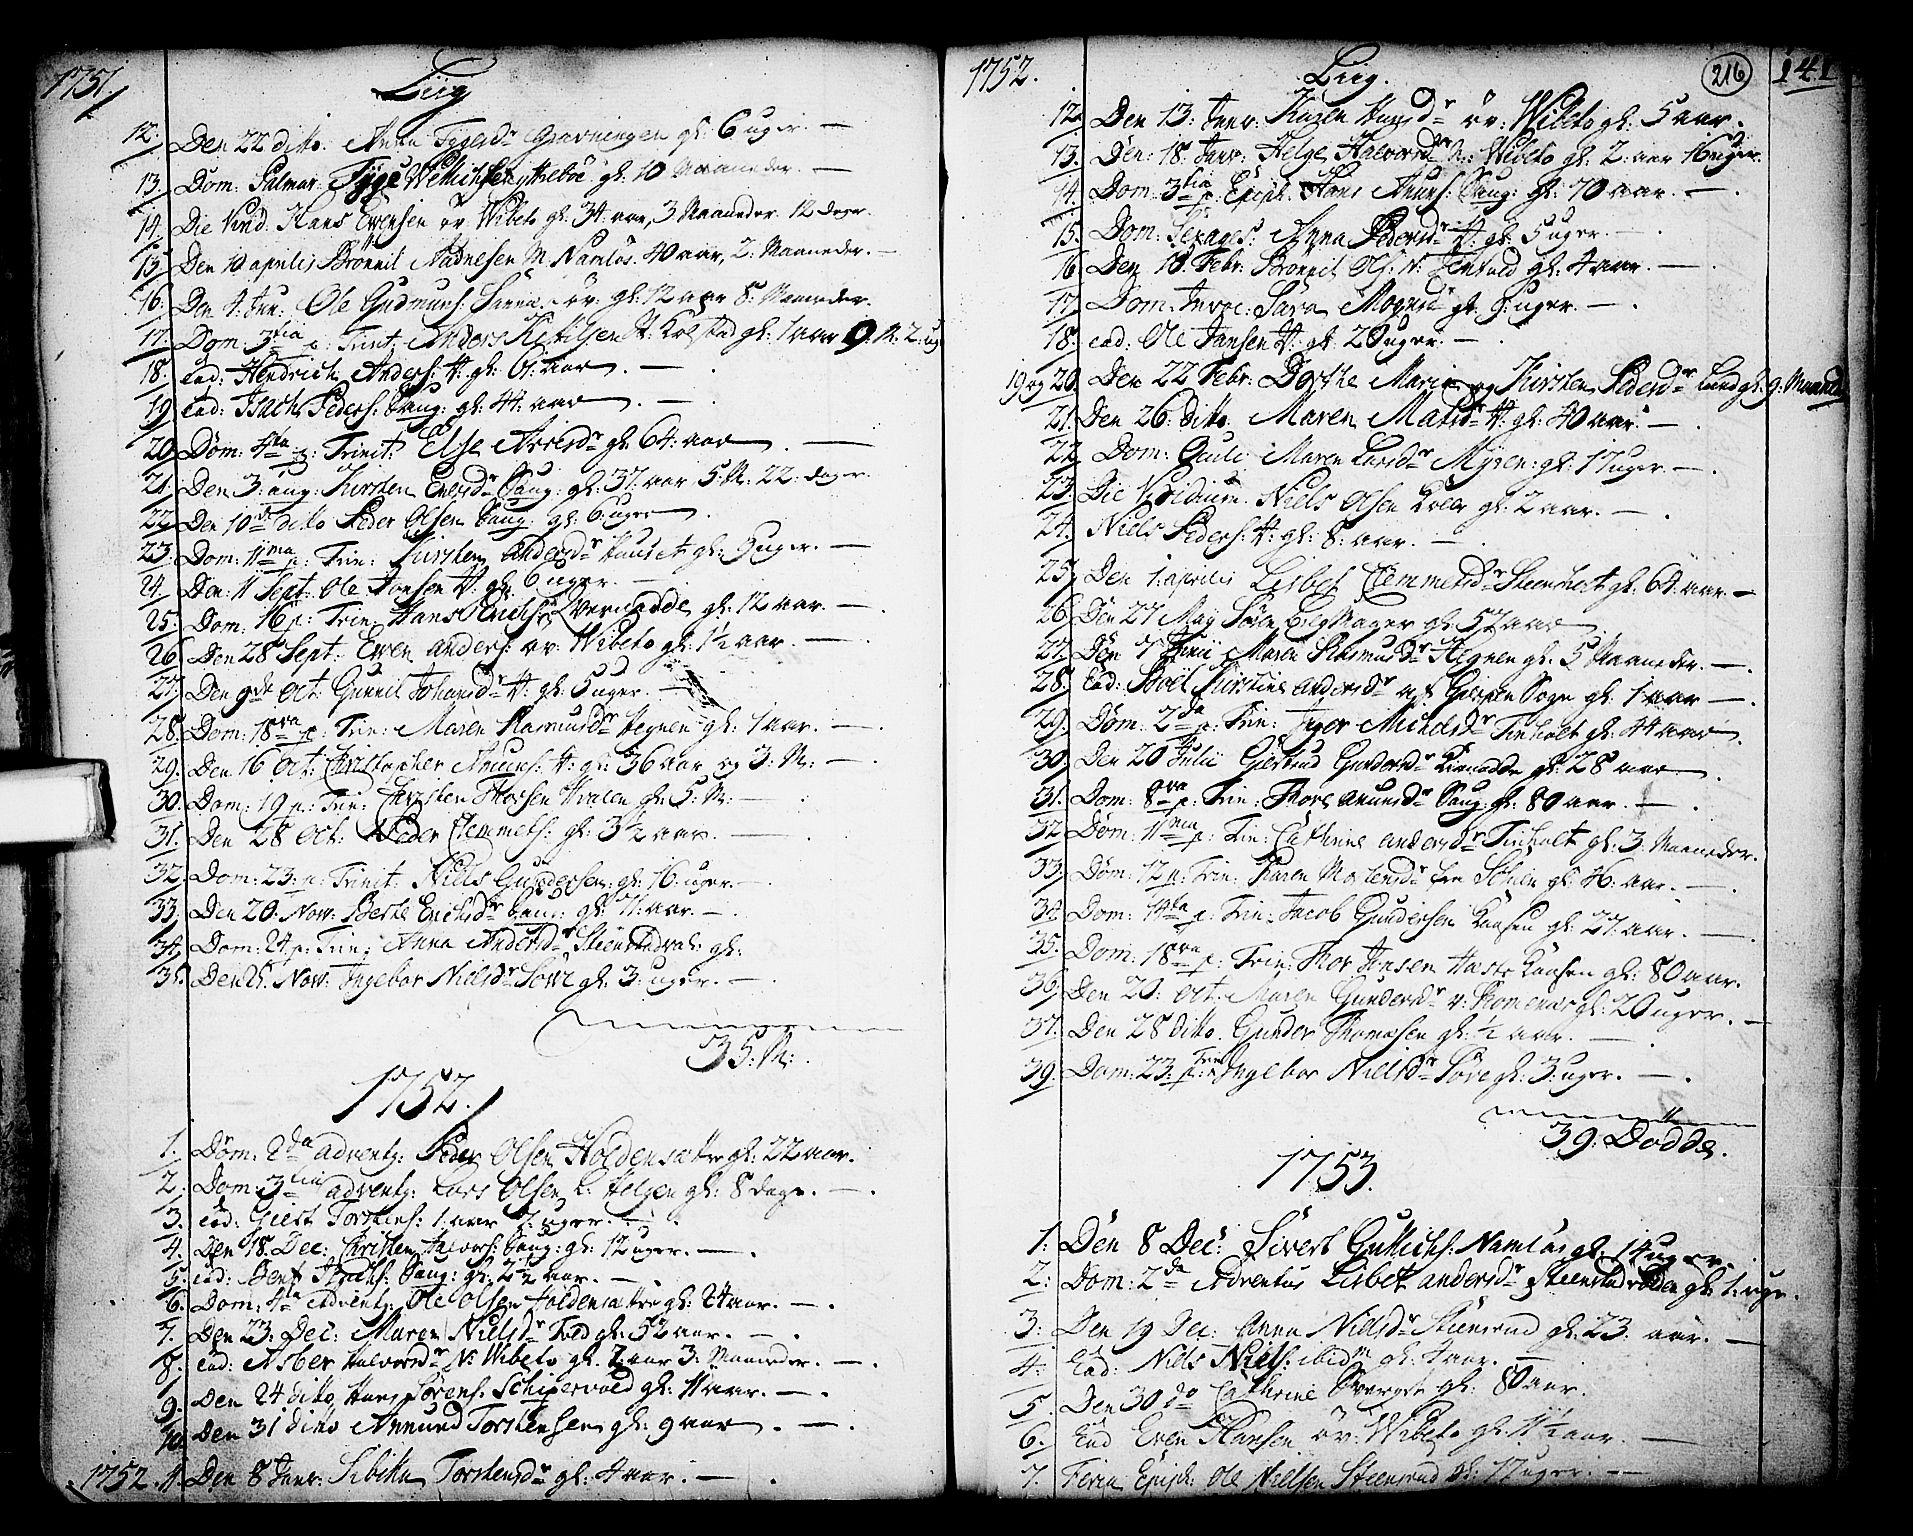 SAKO, Holla kirkebøker, F/Fa/L0001: Ministerialbok nr. 1, 1717-1779, s. 216